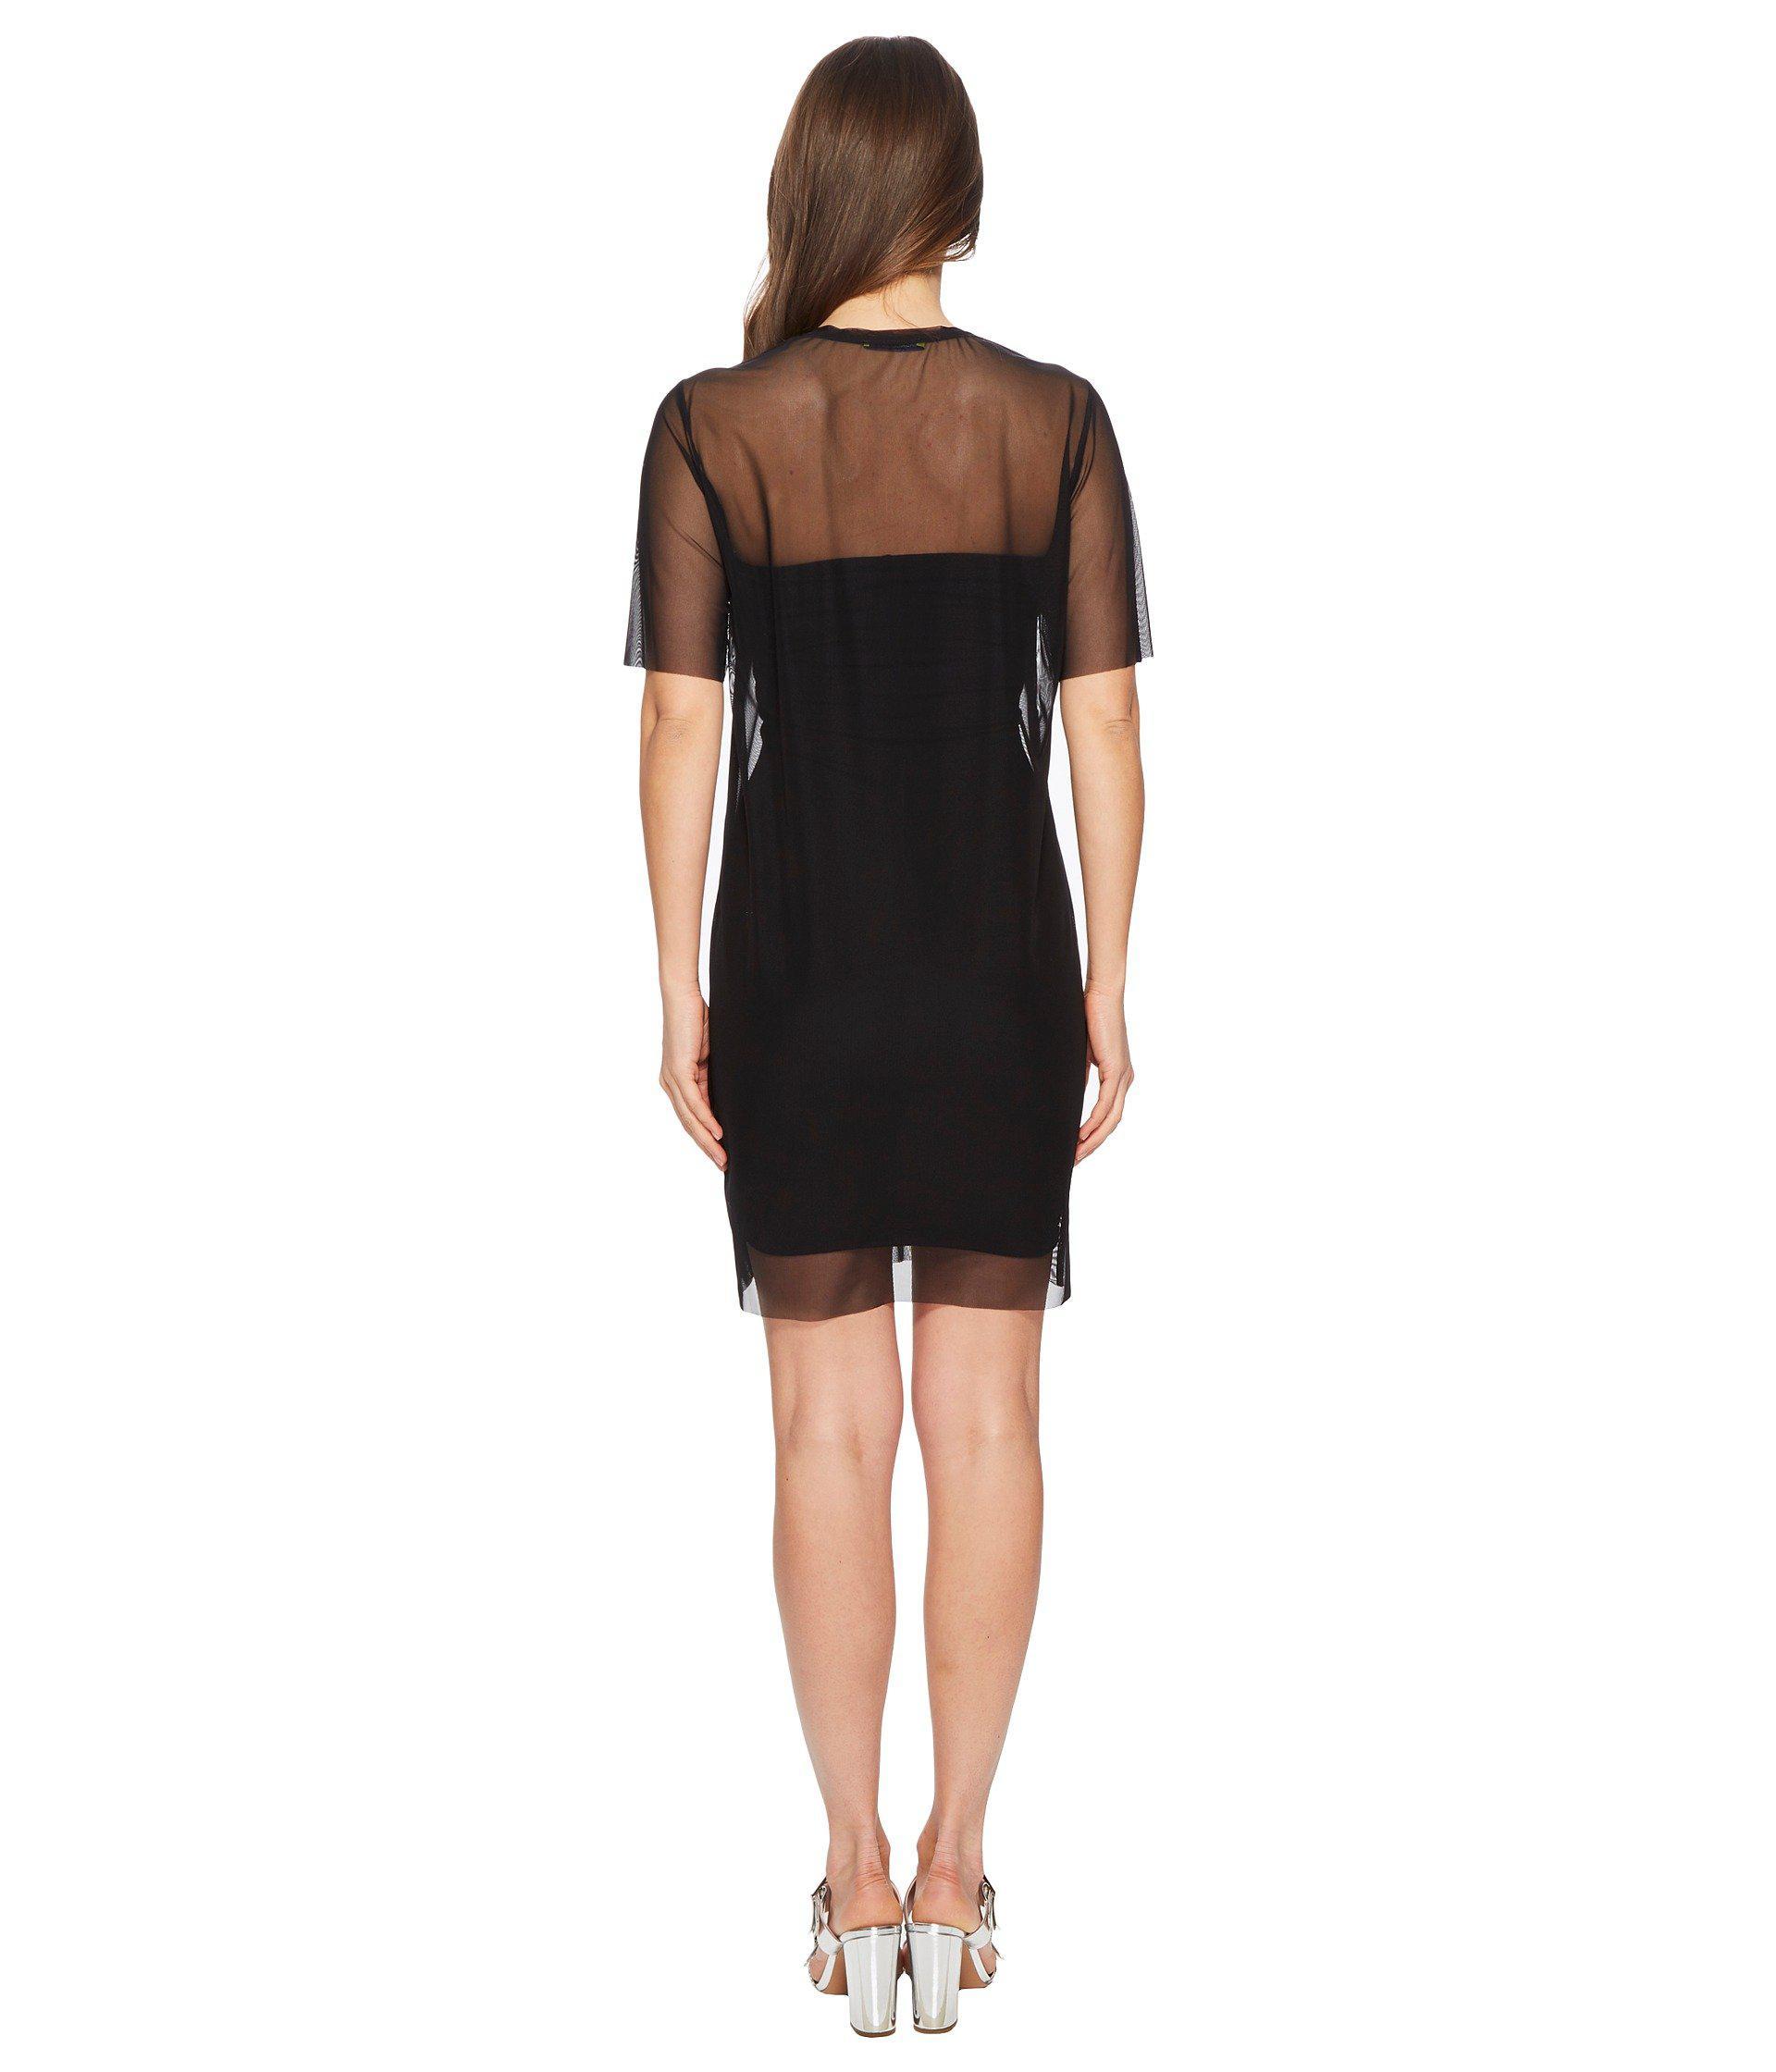 fec1fb5eda0d Versace Jeans - Black Sheer Overlay Short Sleeve Dress - Lyst. View  fullscreen